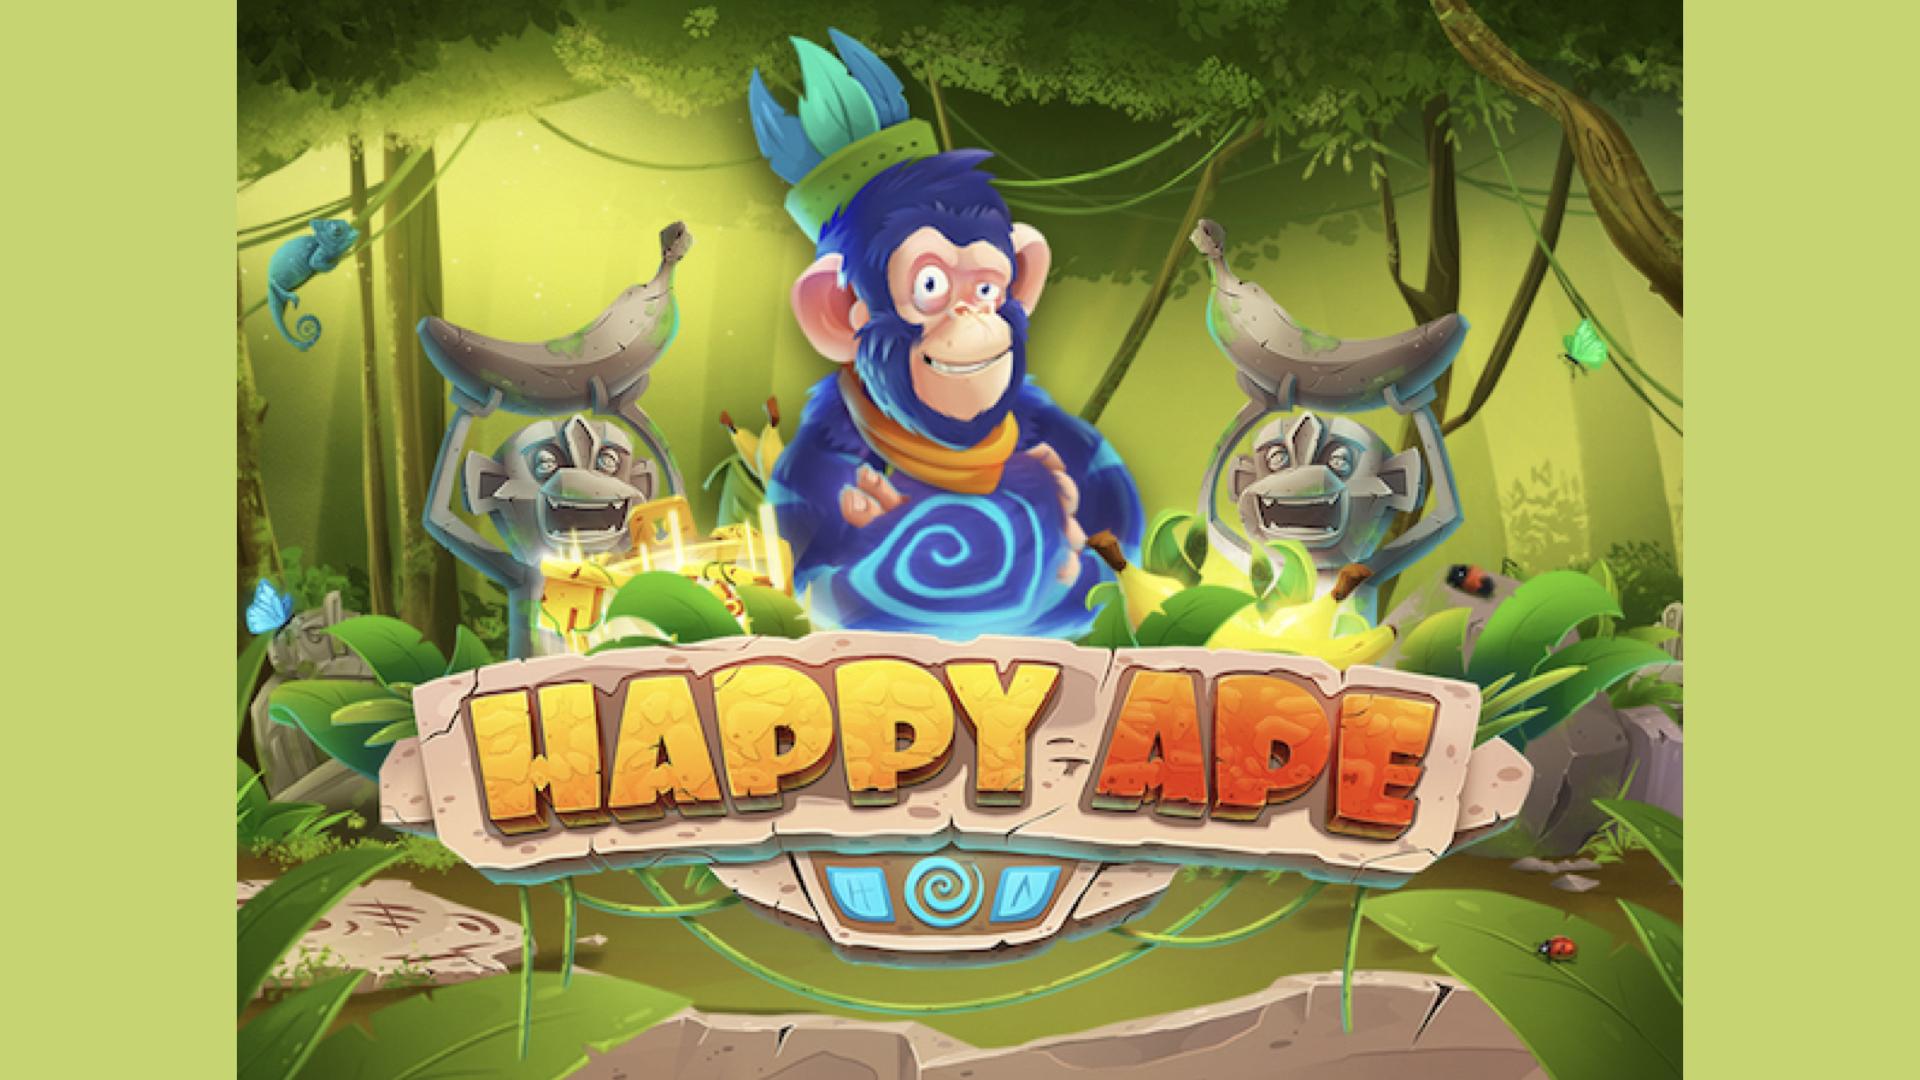 Habanero Happy Ape